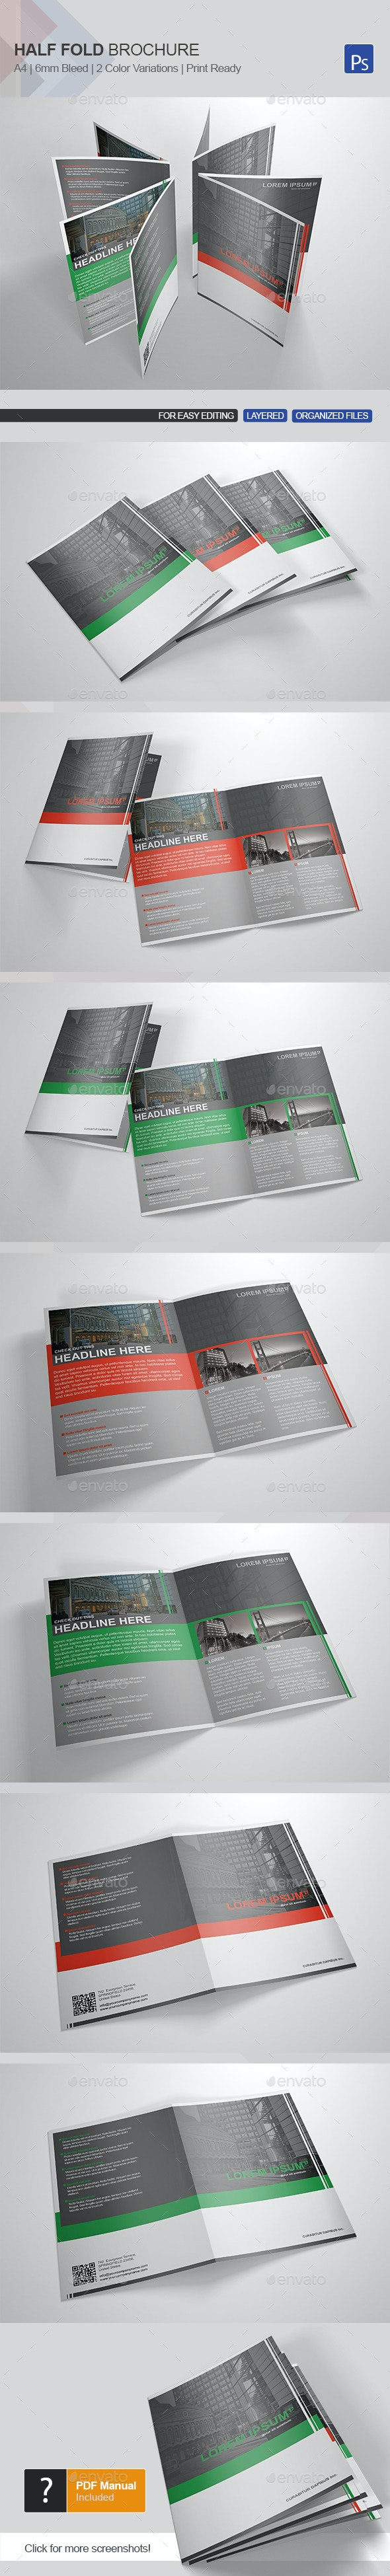 Half-Fold Brochure Template 2 - Brochures Print Templates